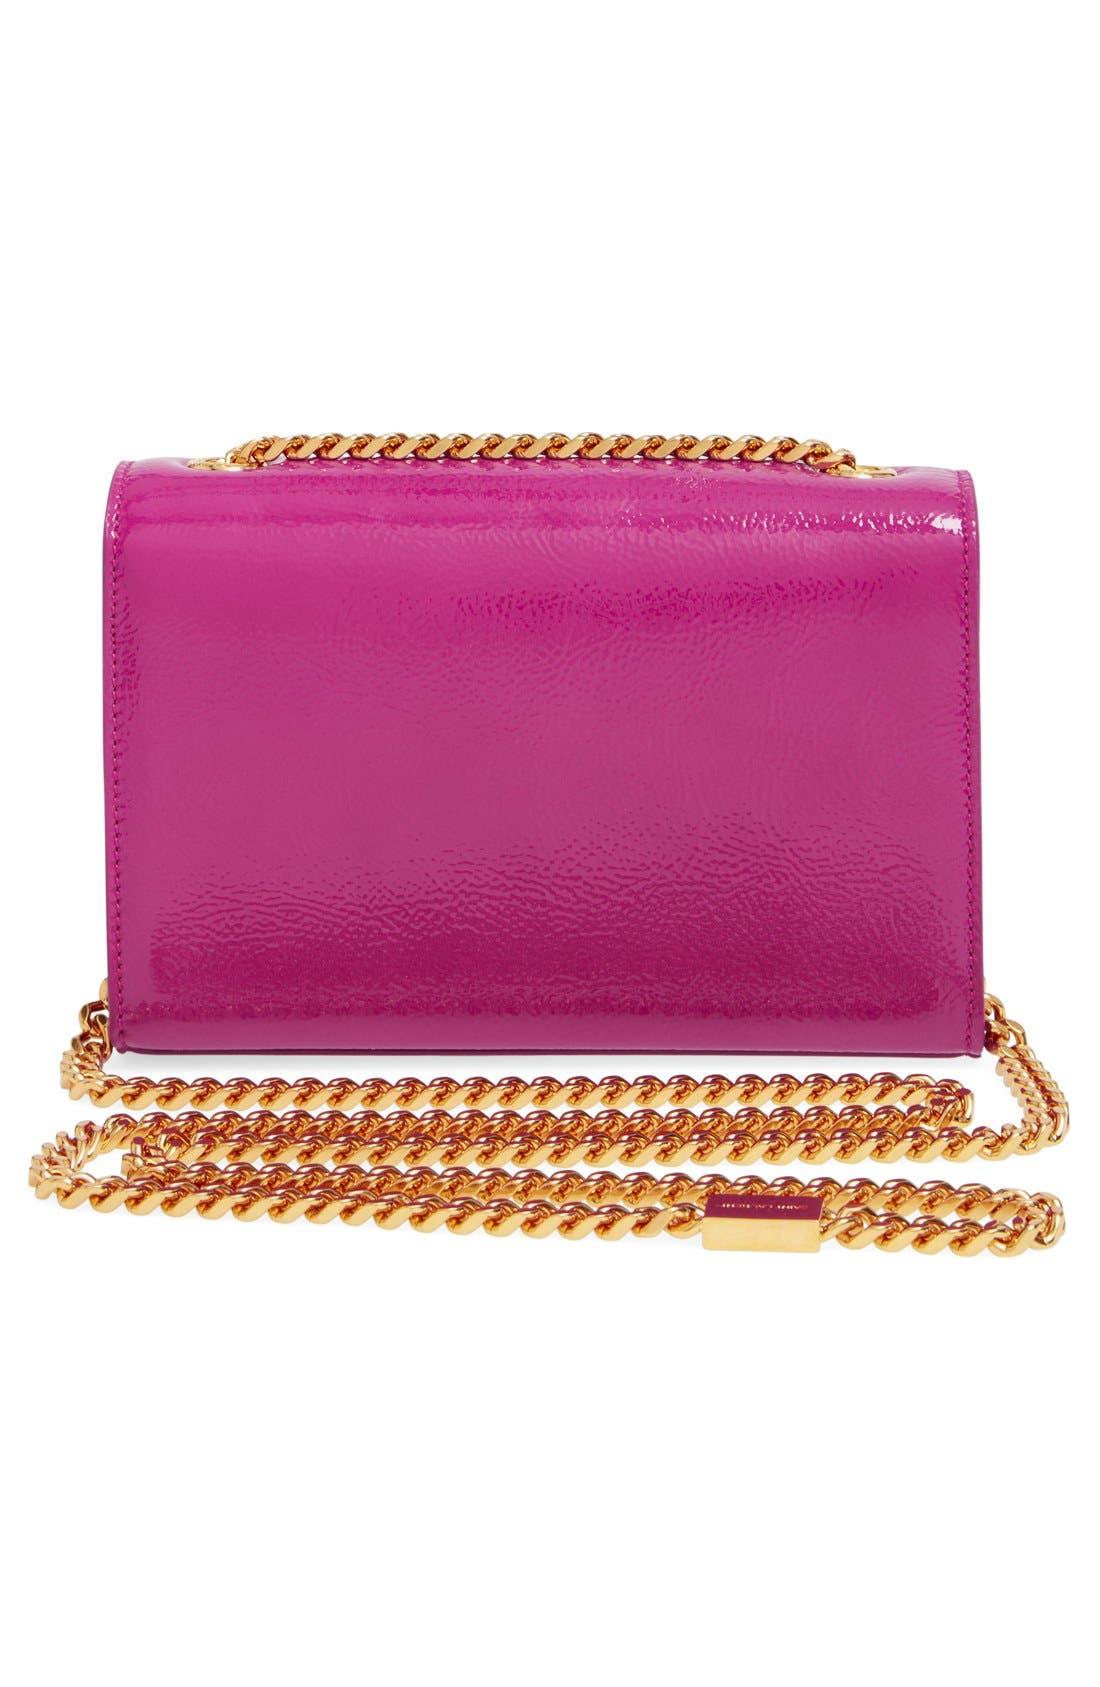 Alternate Image 3  - Saint Laurent 'Mini Monogram Vernis' Handbag